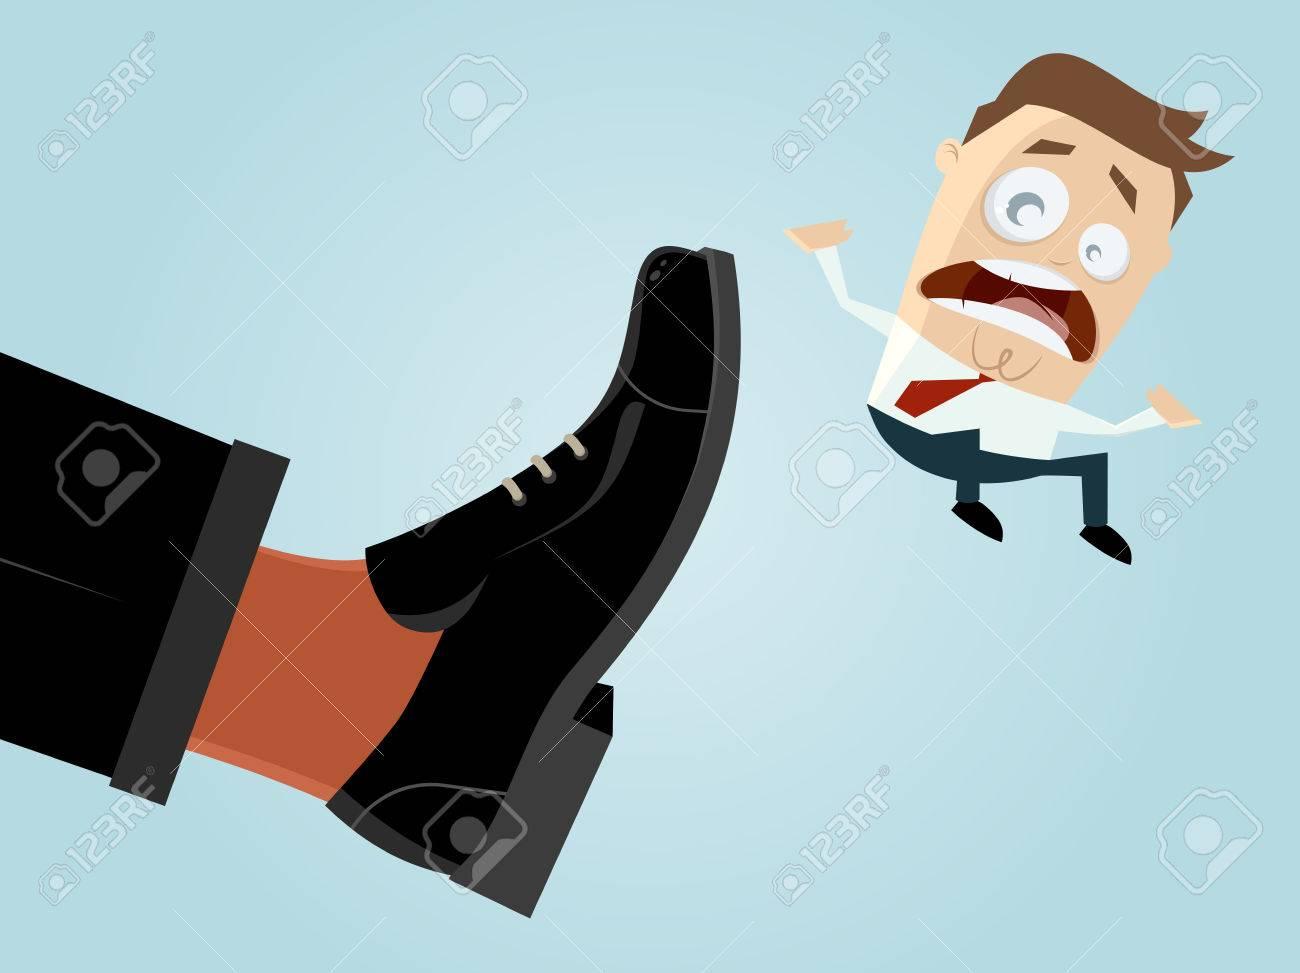 businessman is fired Standard-Bild - 53423541